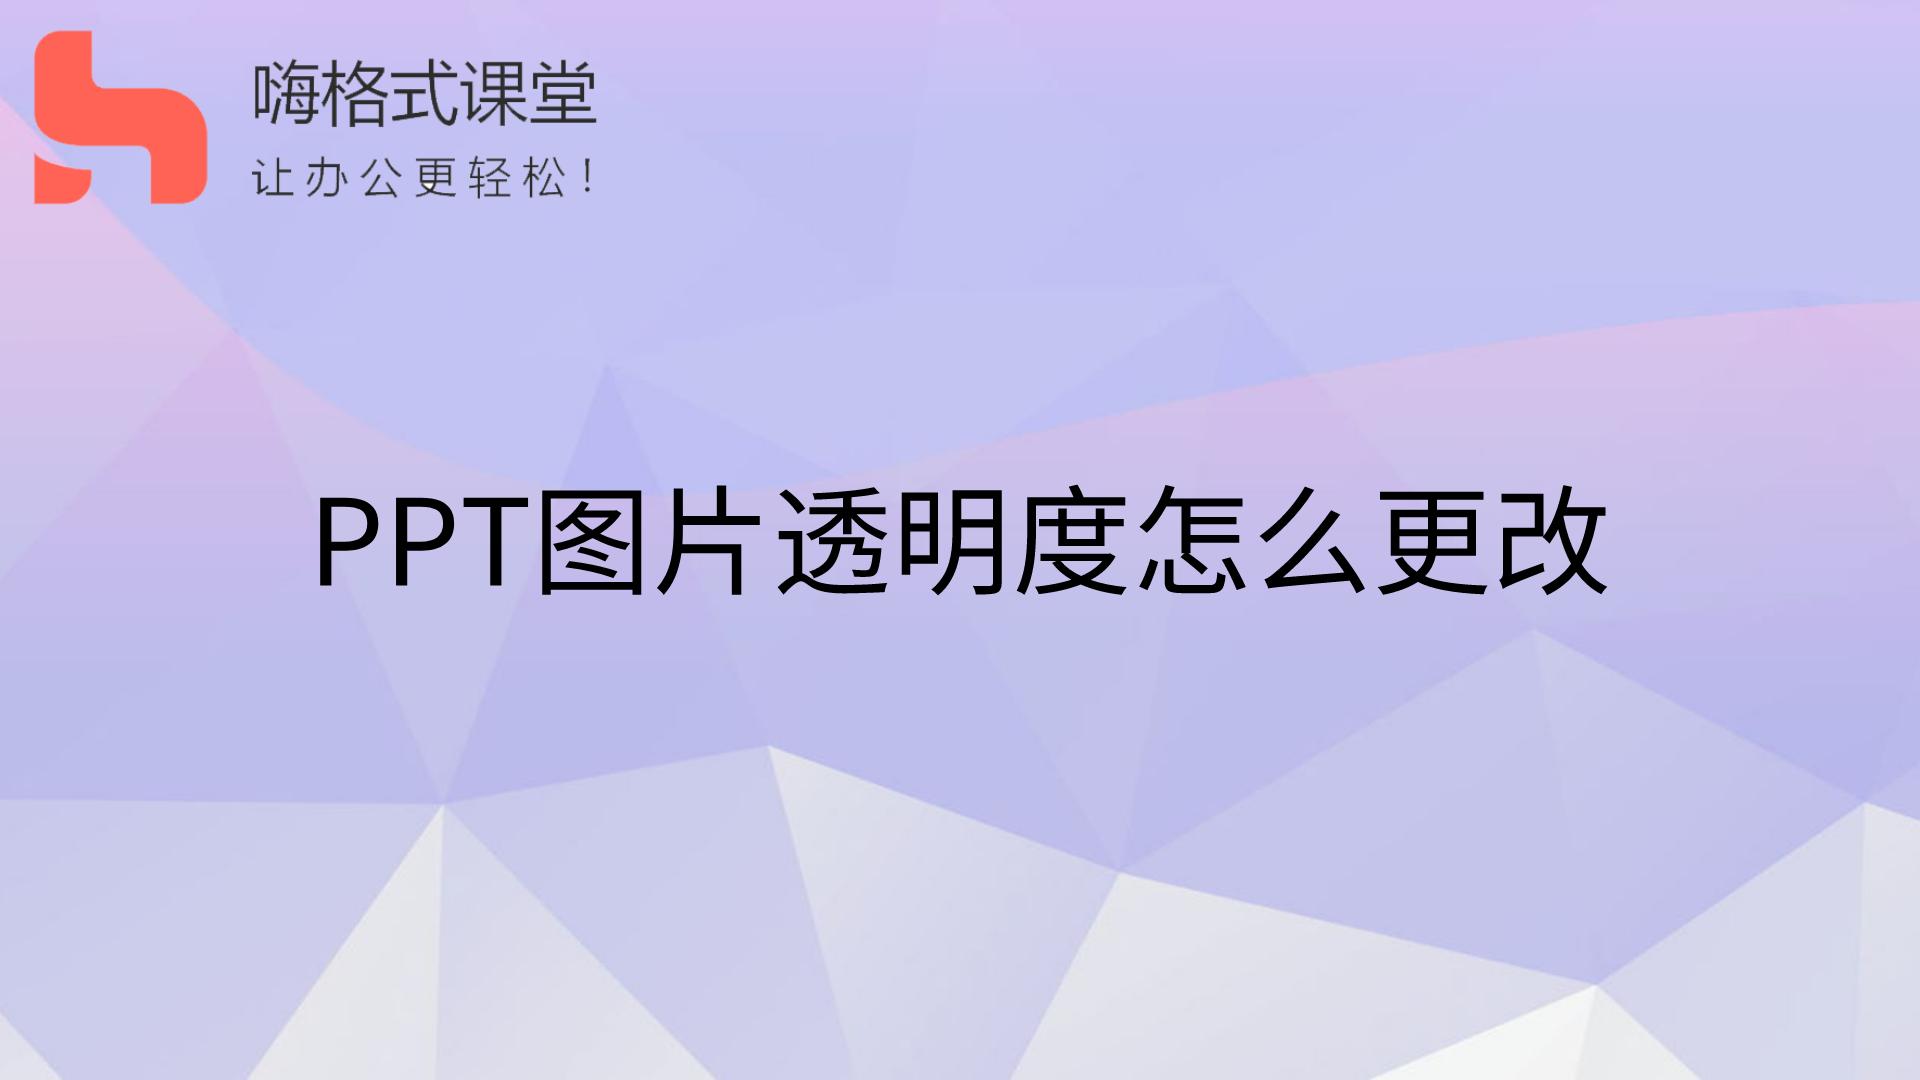 PPT图片透明度怎么更改